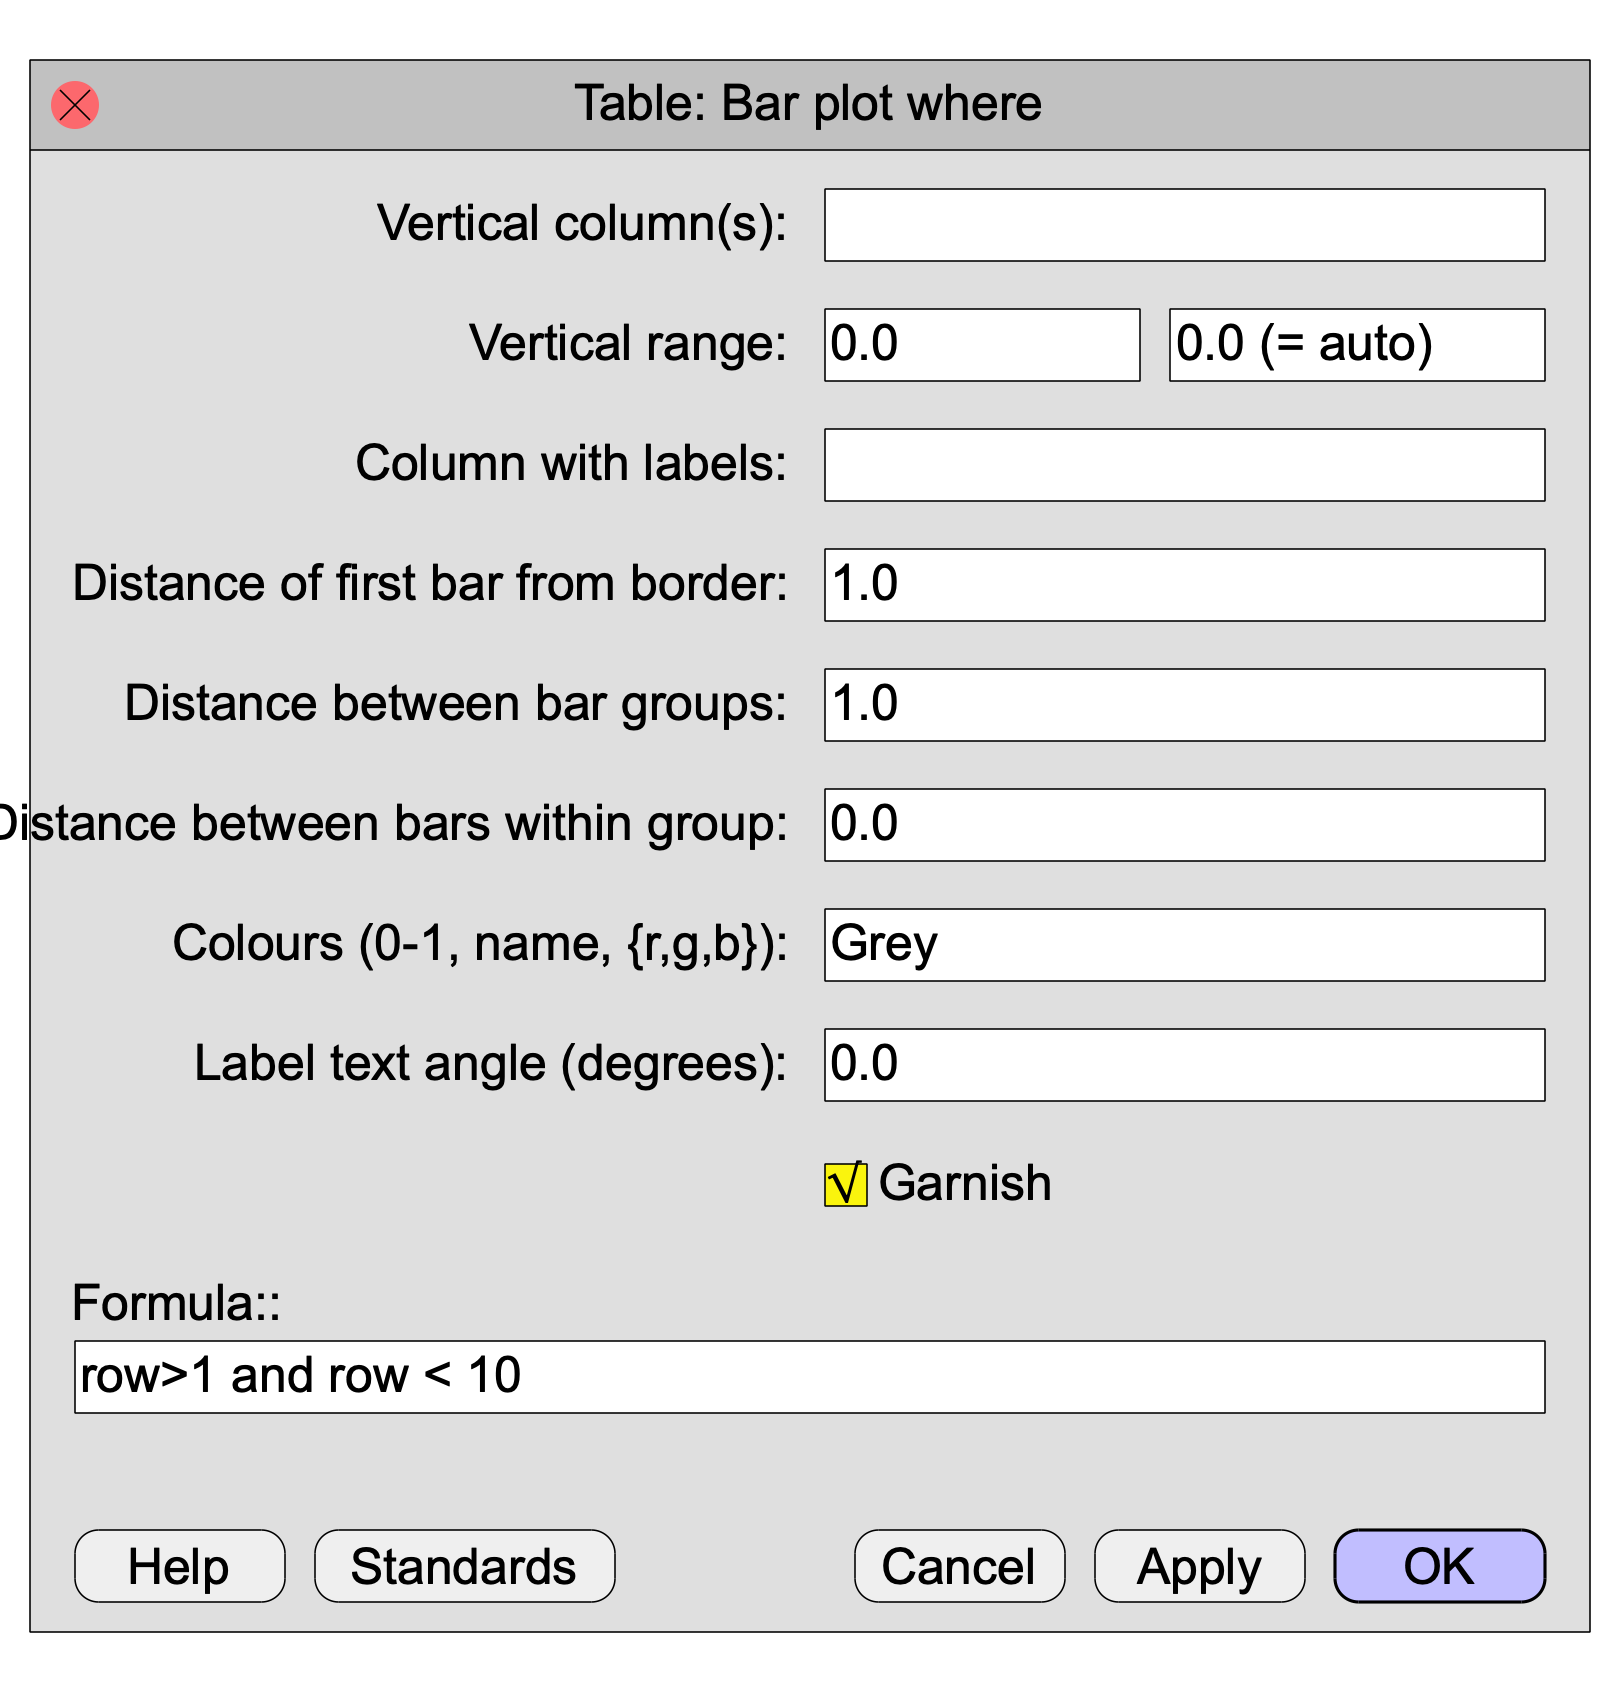 Table: Bar plot where